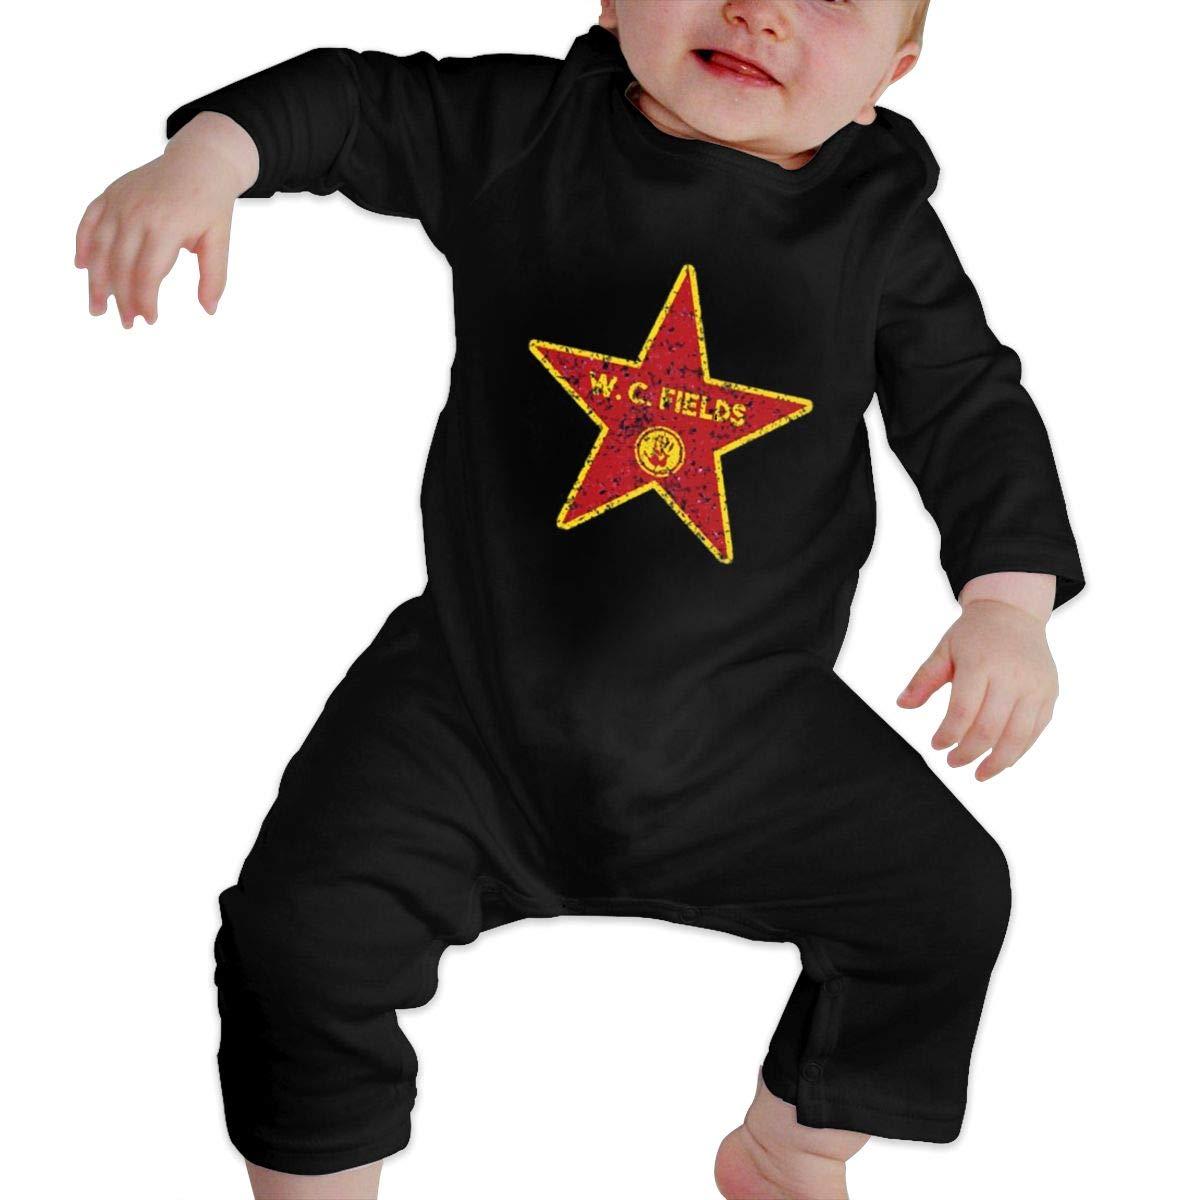 Fional Infant Long Sleeve Romper W.C Fields-Walk of Fame Newborn Babys 0-24M Organic Cotton Jumpsuit Outfit